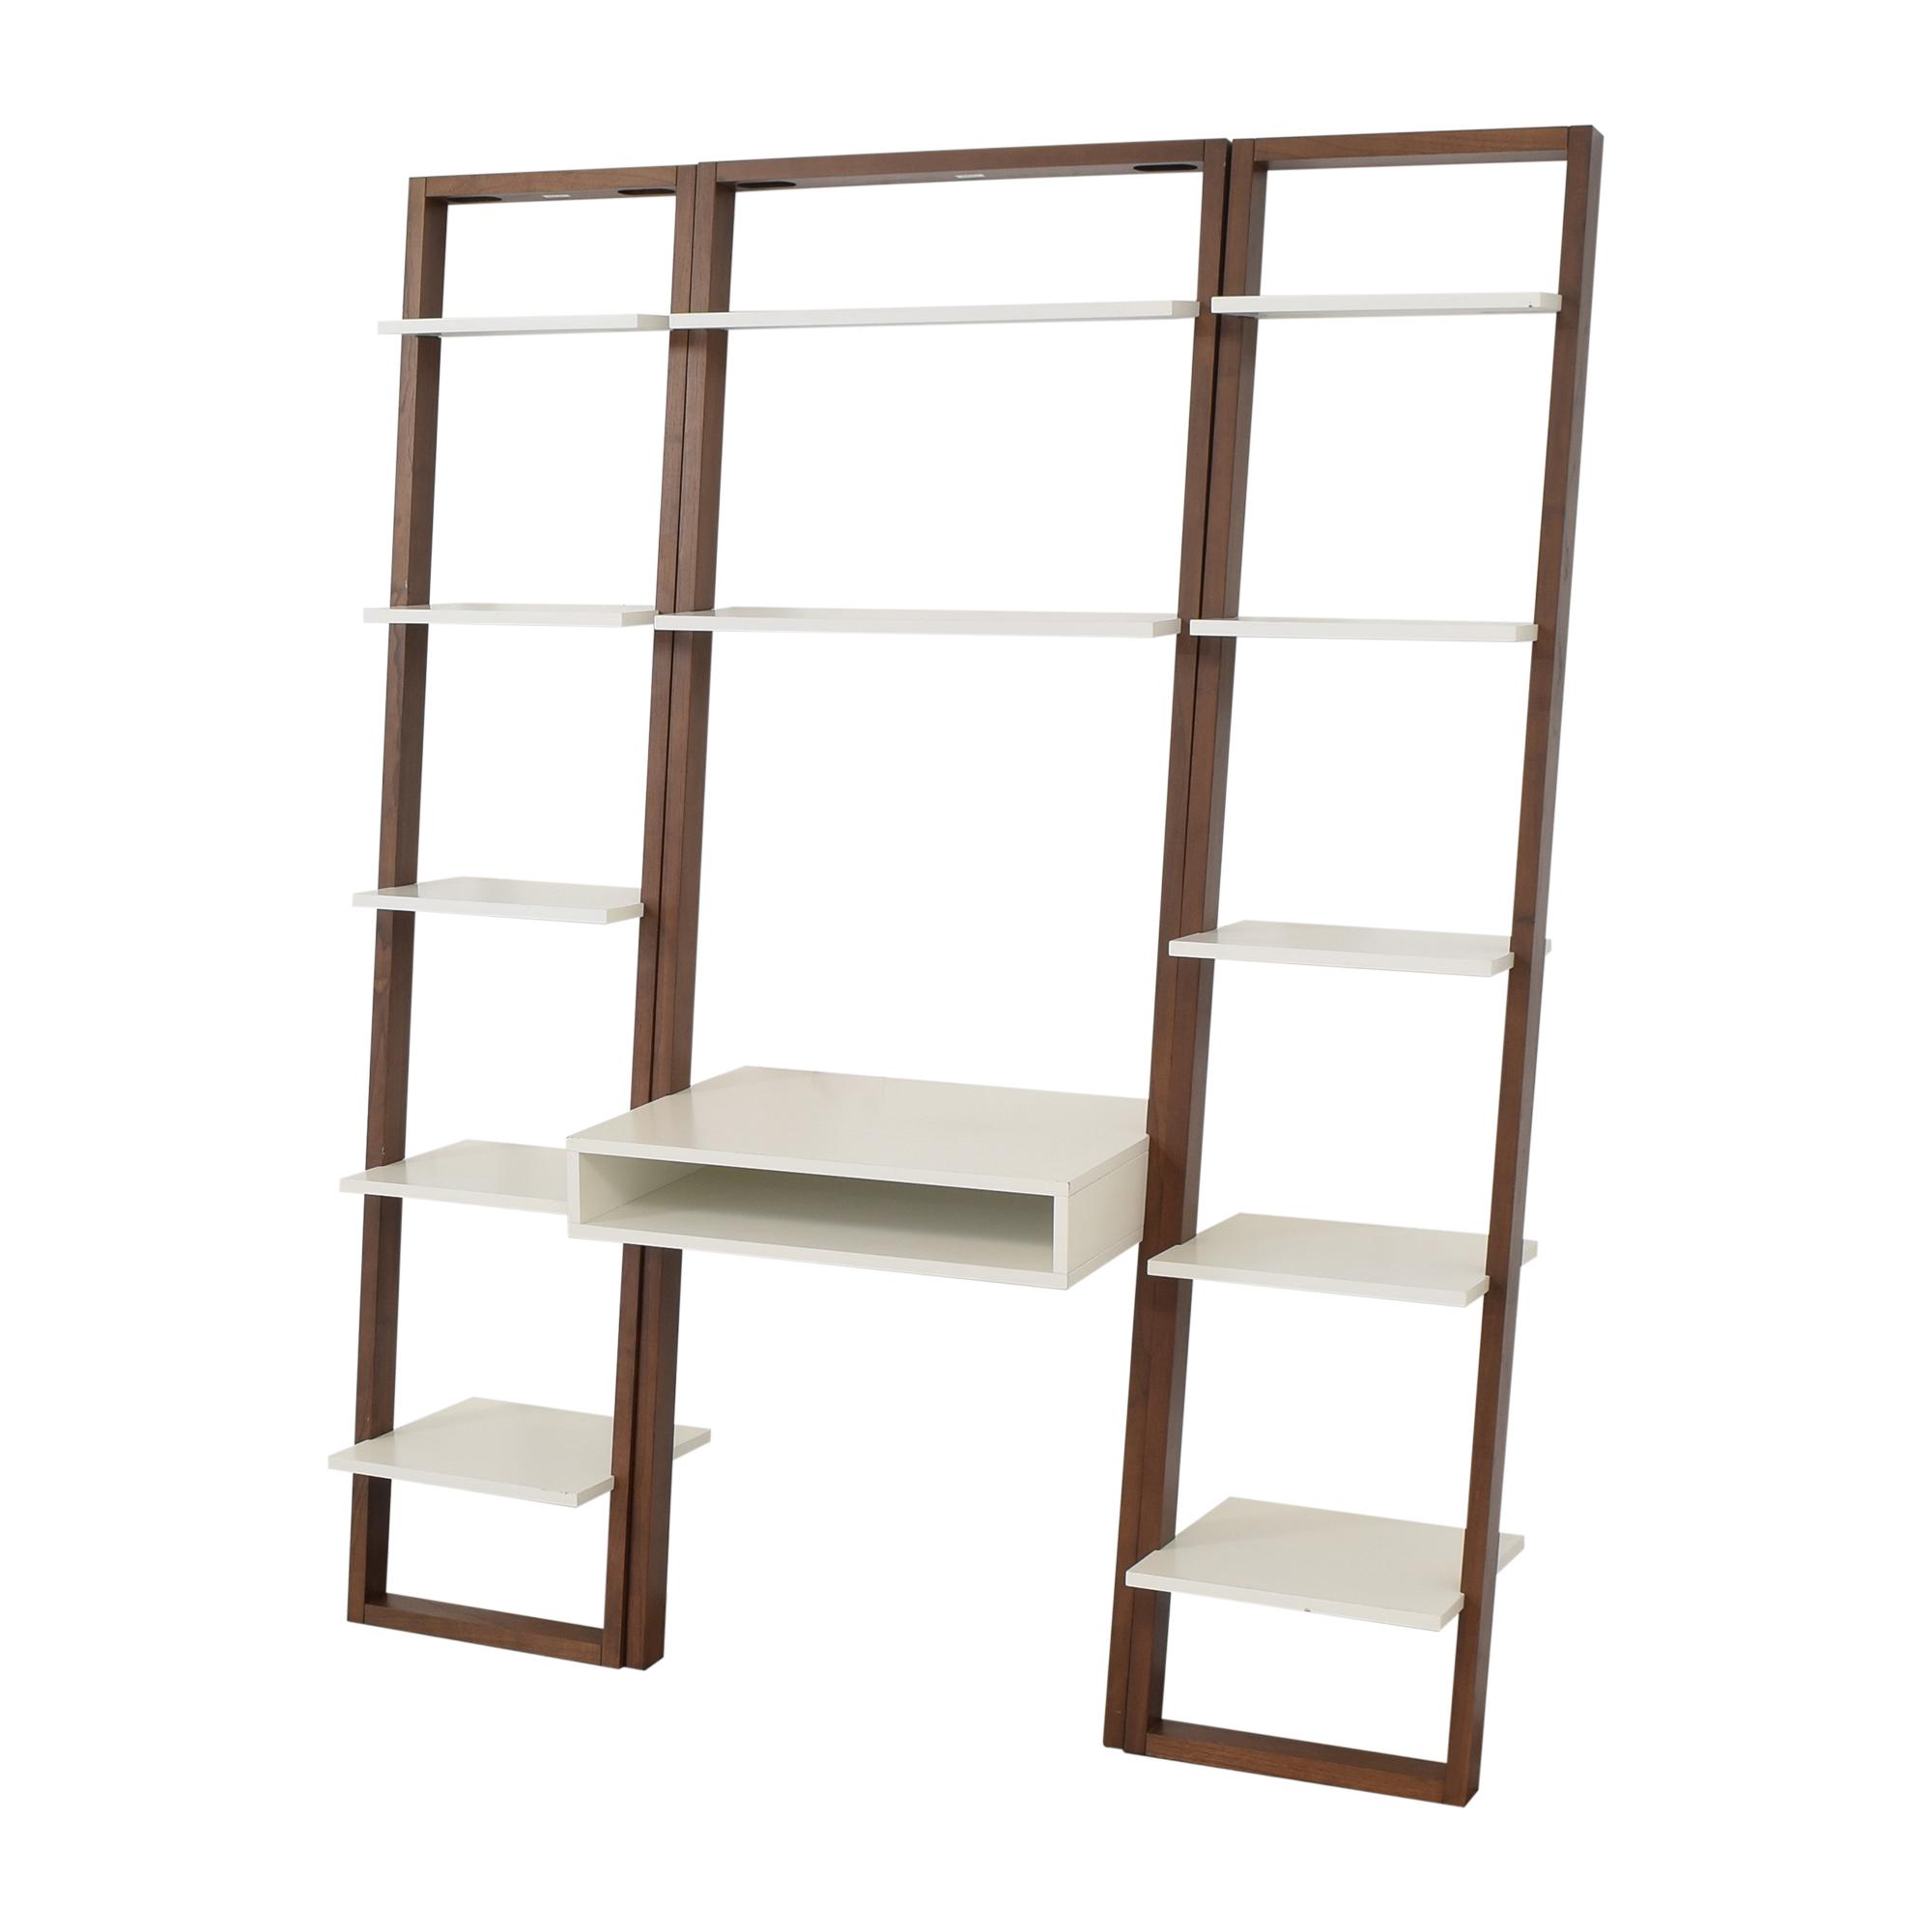 32 Off West Elm West Elm Ladder Shelf Storage Leaning Wall Desk With Two Narrow Shelves Storage